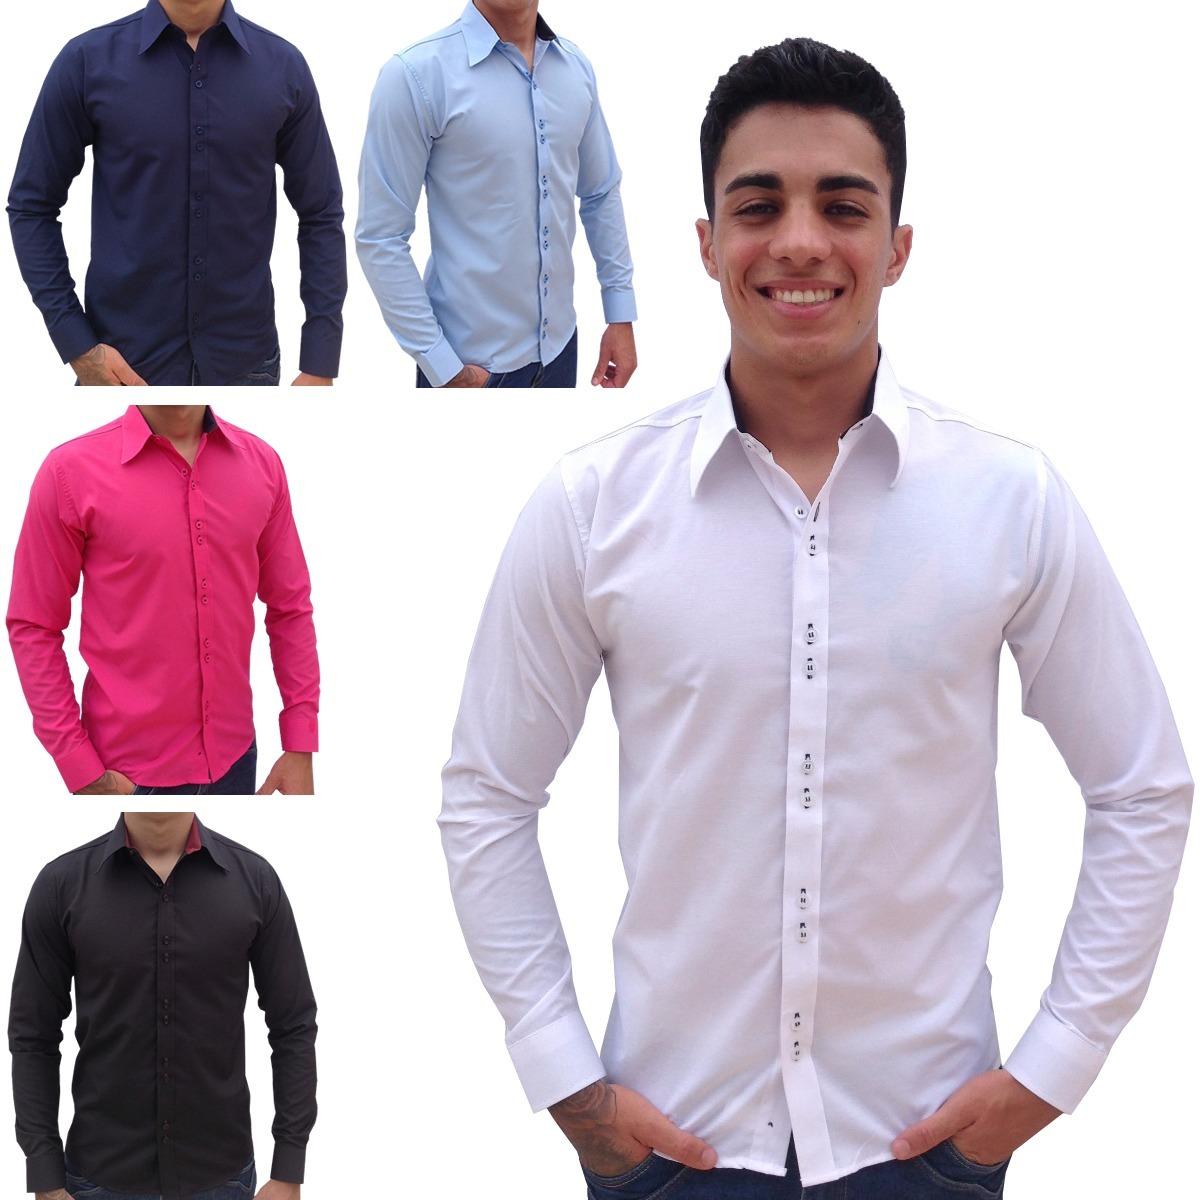 24b803731 kit 3 camisas social masculina slim blusa camiseta longa wel. Carregando  zoom.